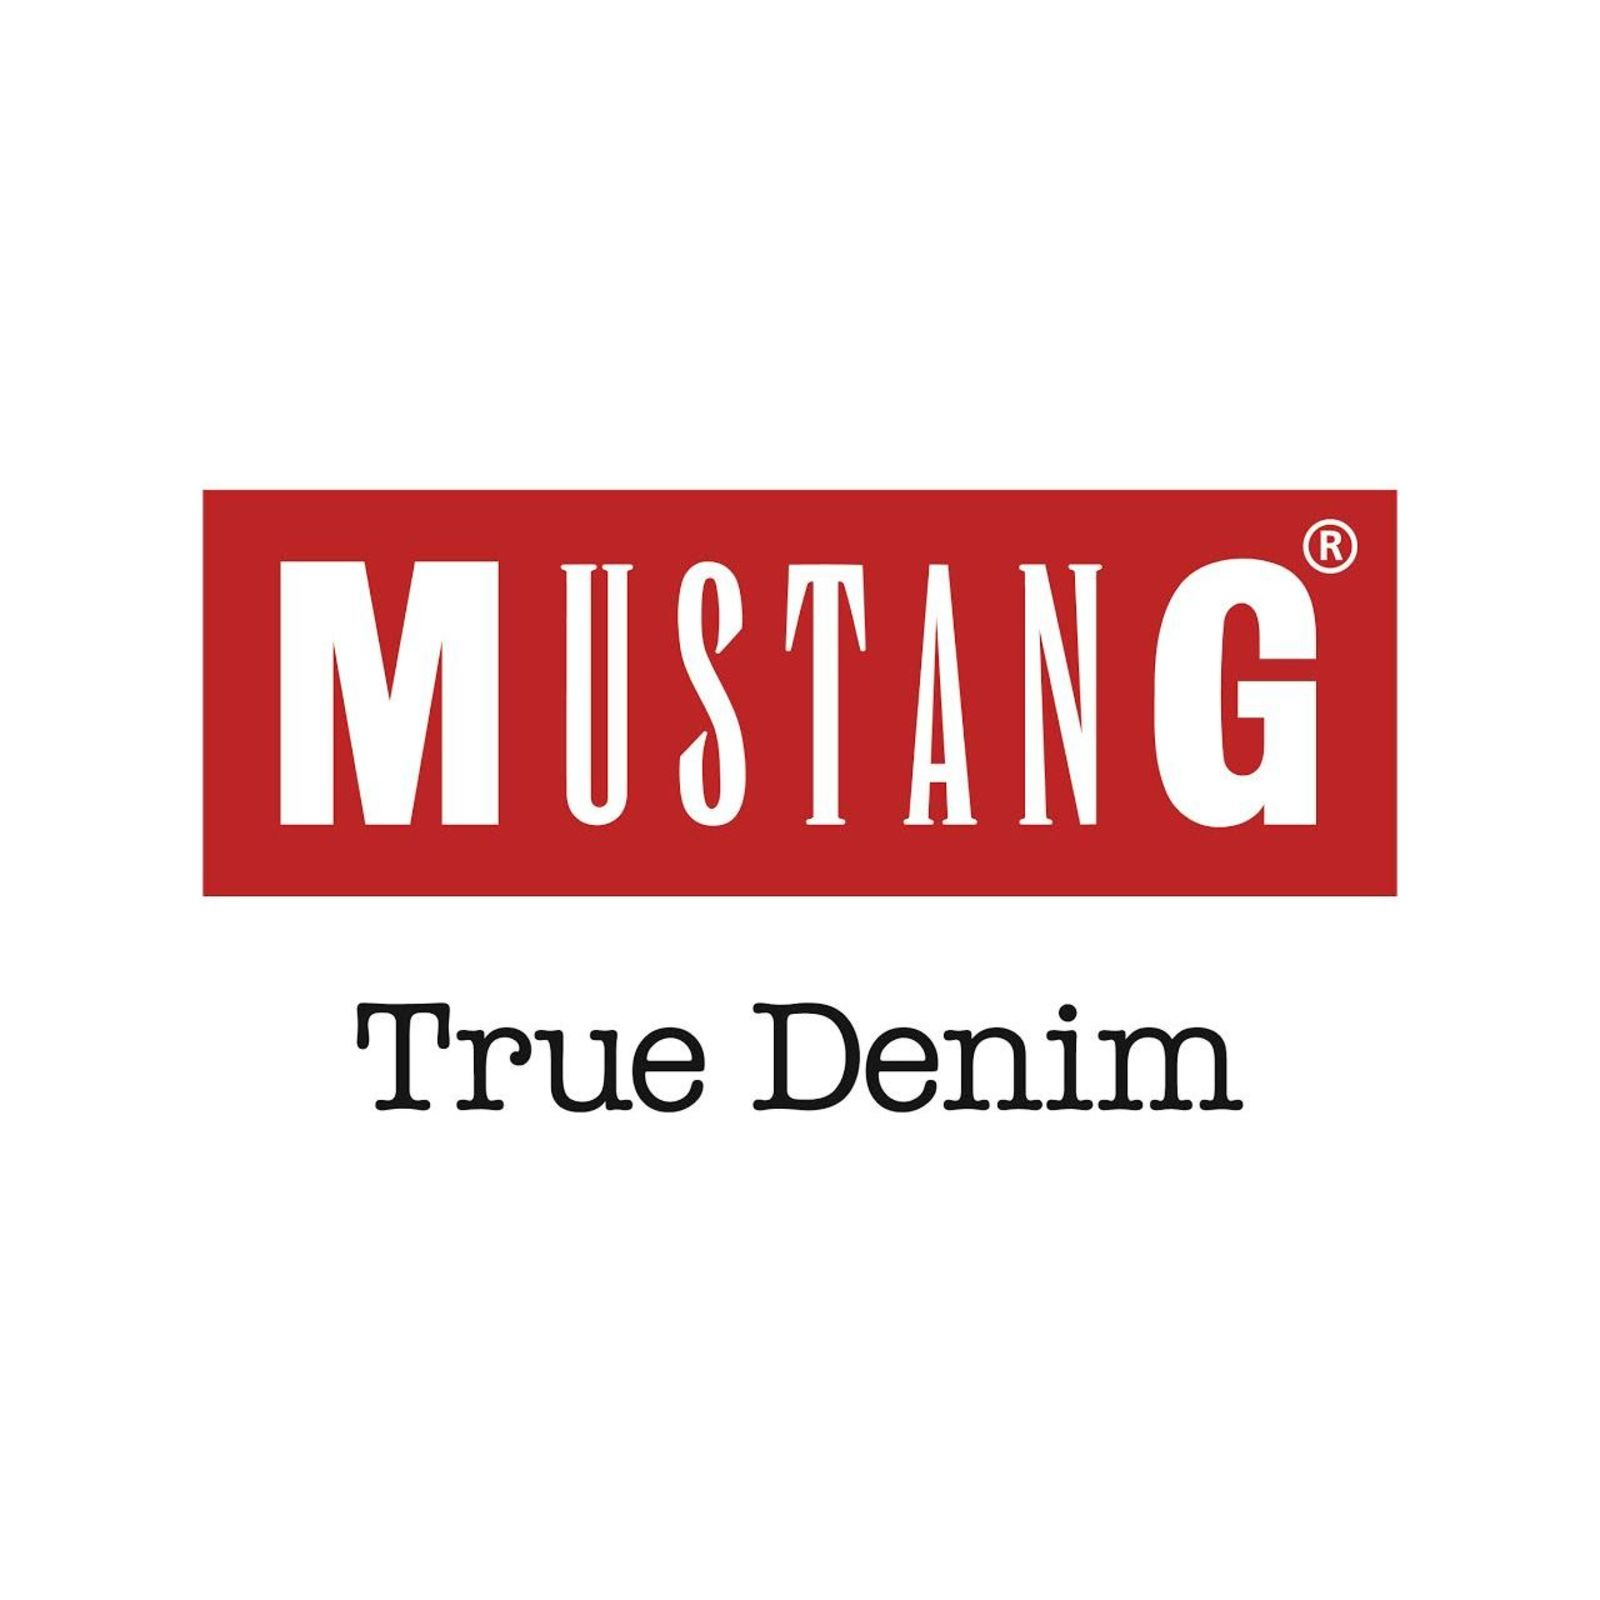 MUSTANG (Bild 1)